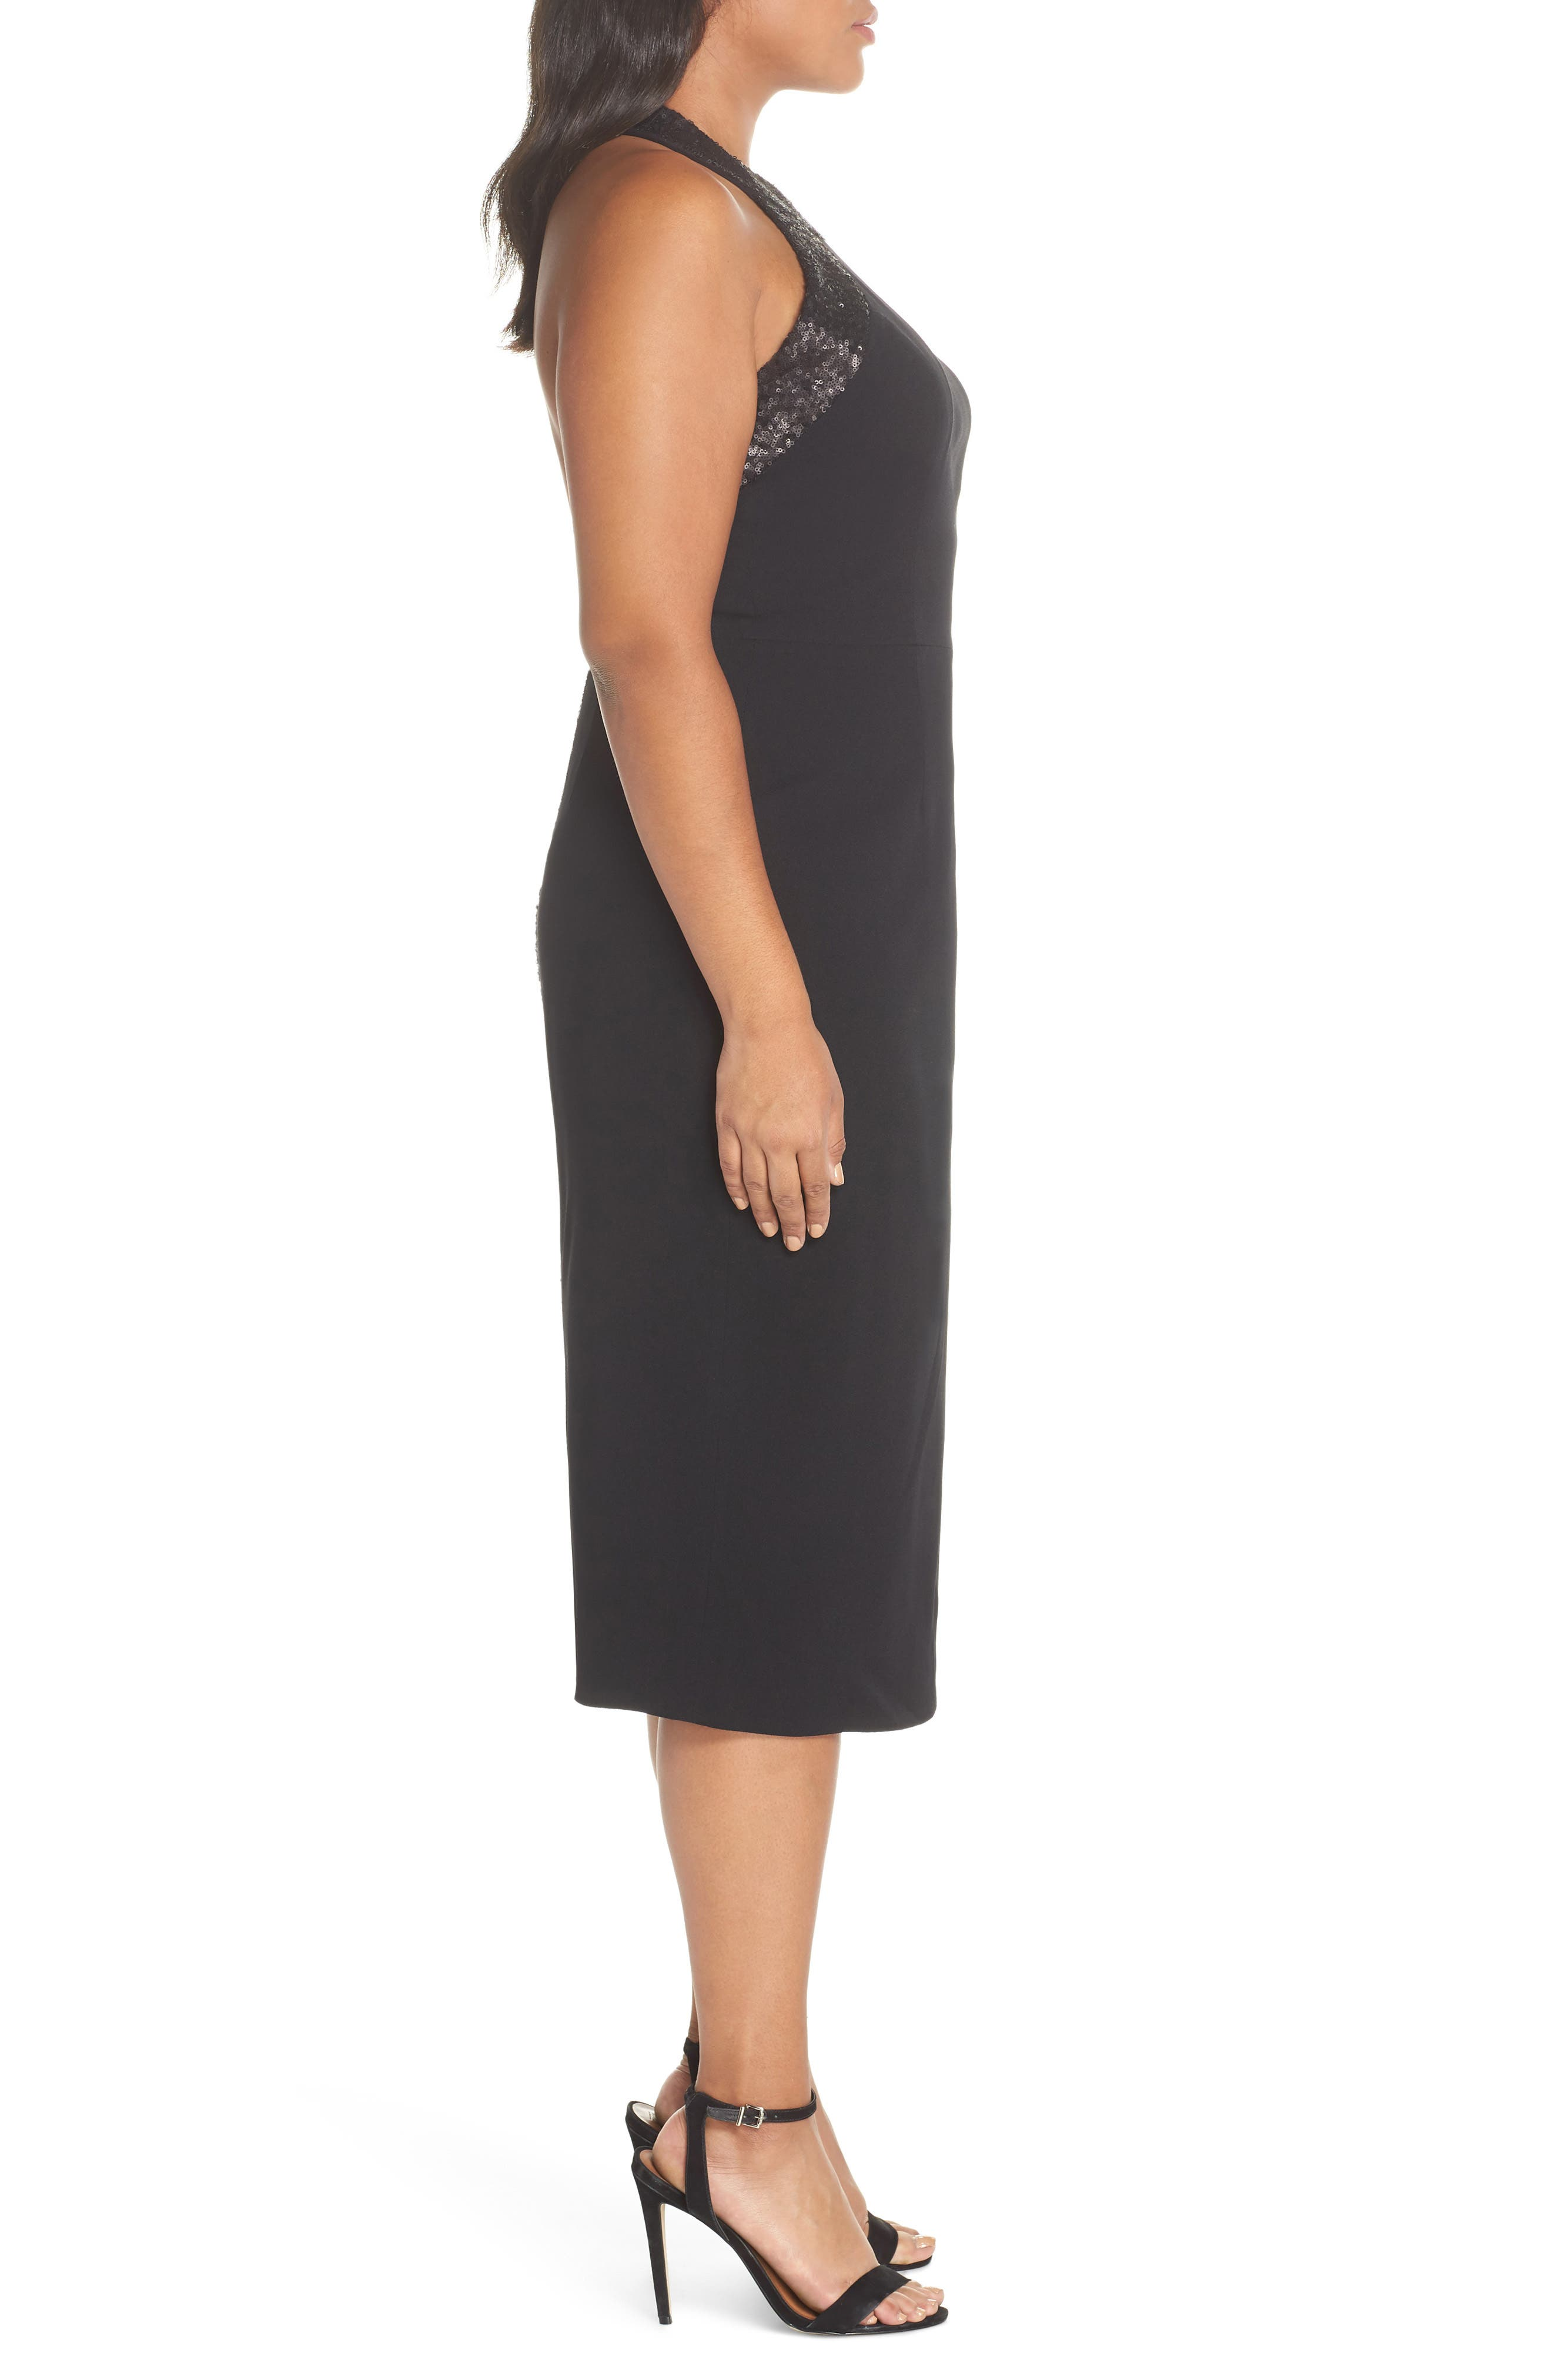 Cleo Halter Dress,                             Alternate thumbnail 8, color,                             BLACK/ BLACK